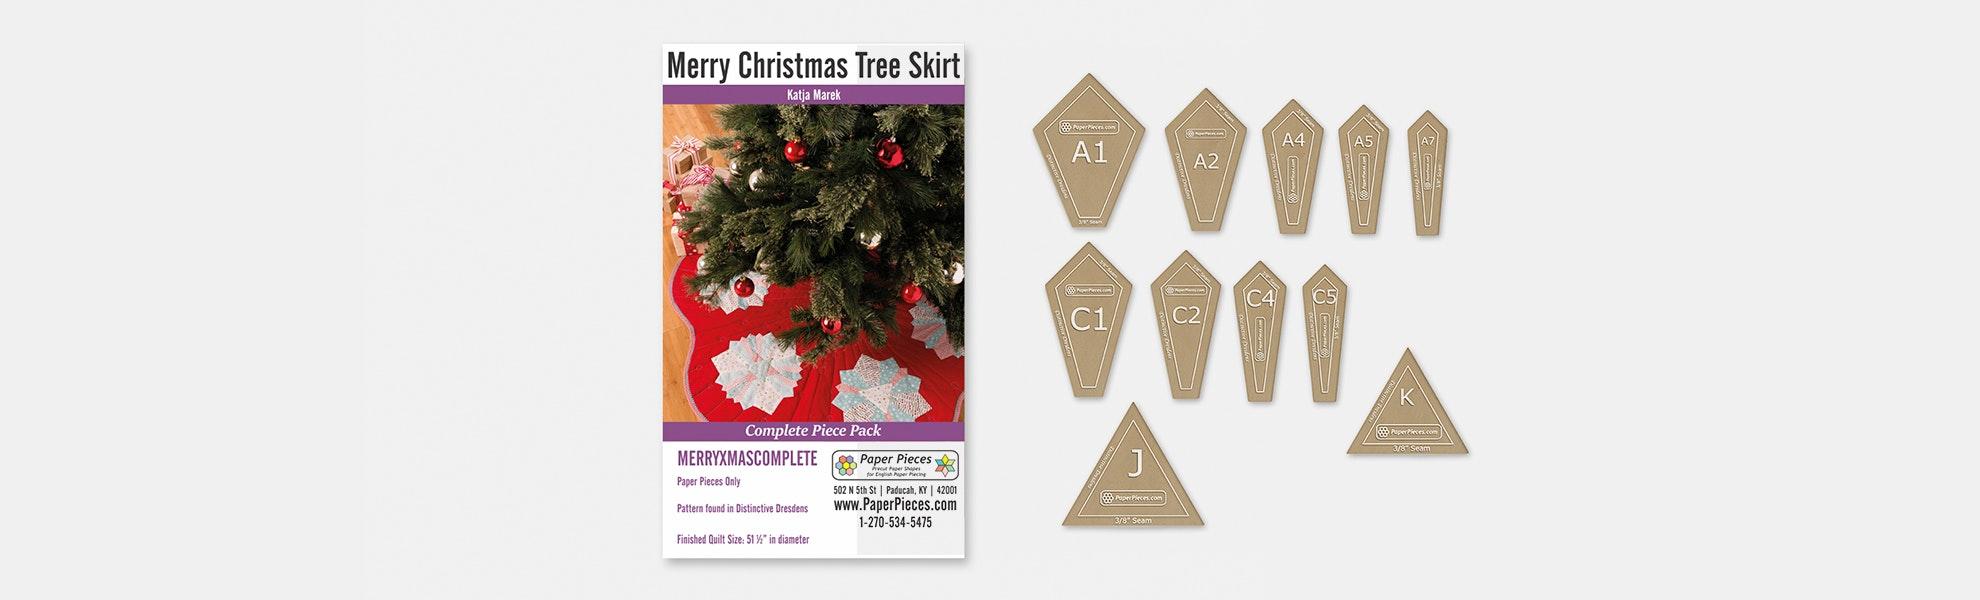 Merry Christmas Tree Skirt Paper-Piece Bundle